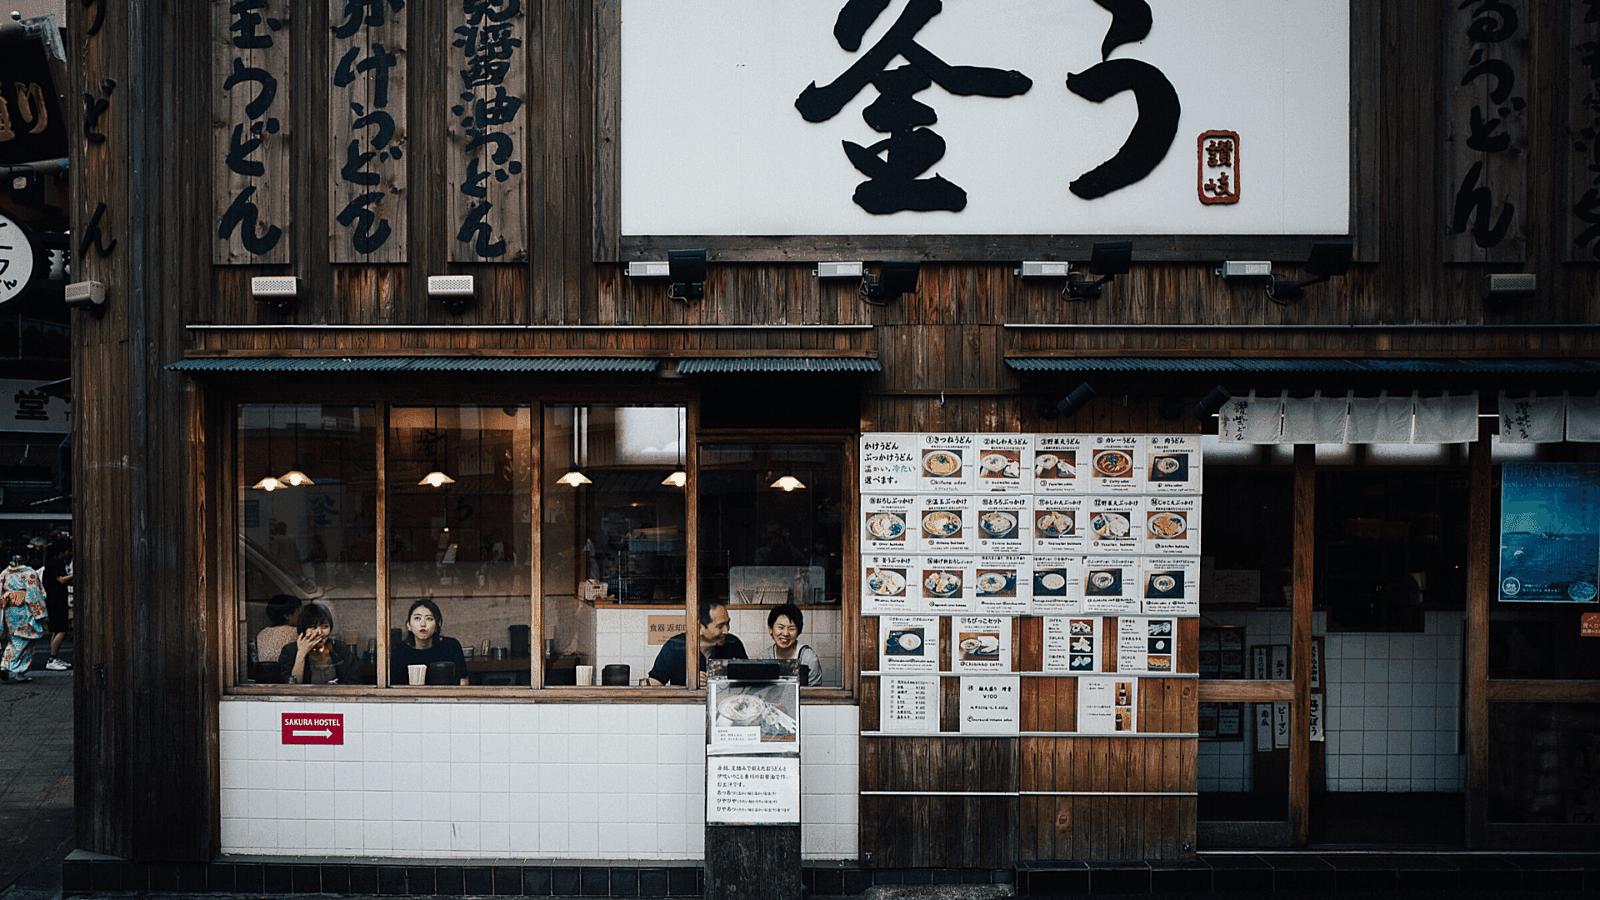 Restaurant menu analysis